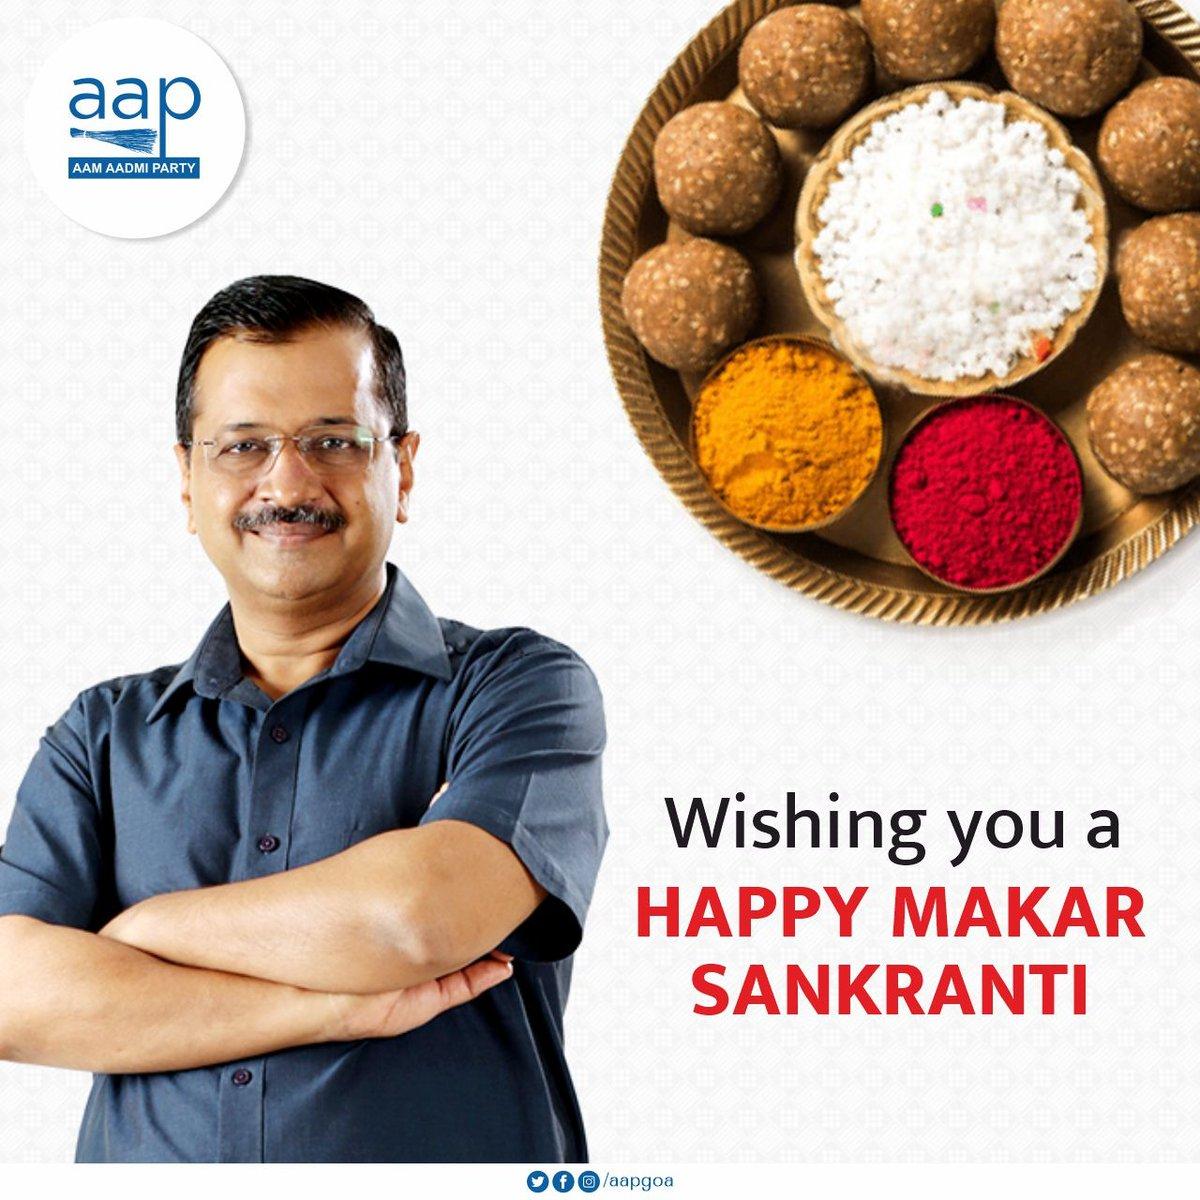 Wishing all Goans a Happy Makar Sankranti